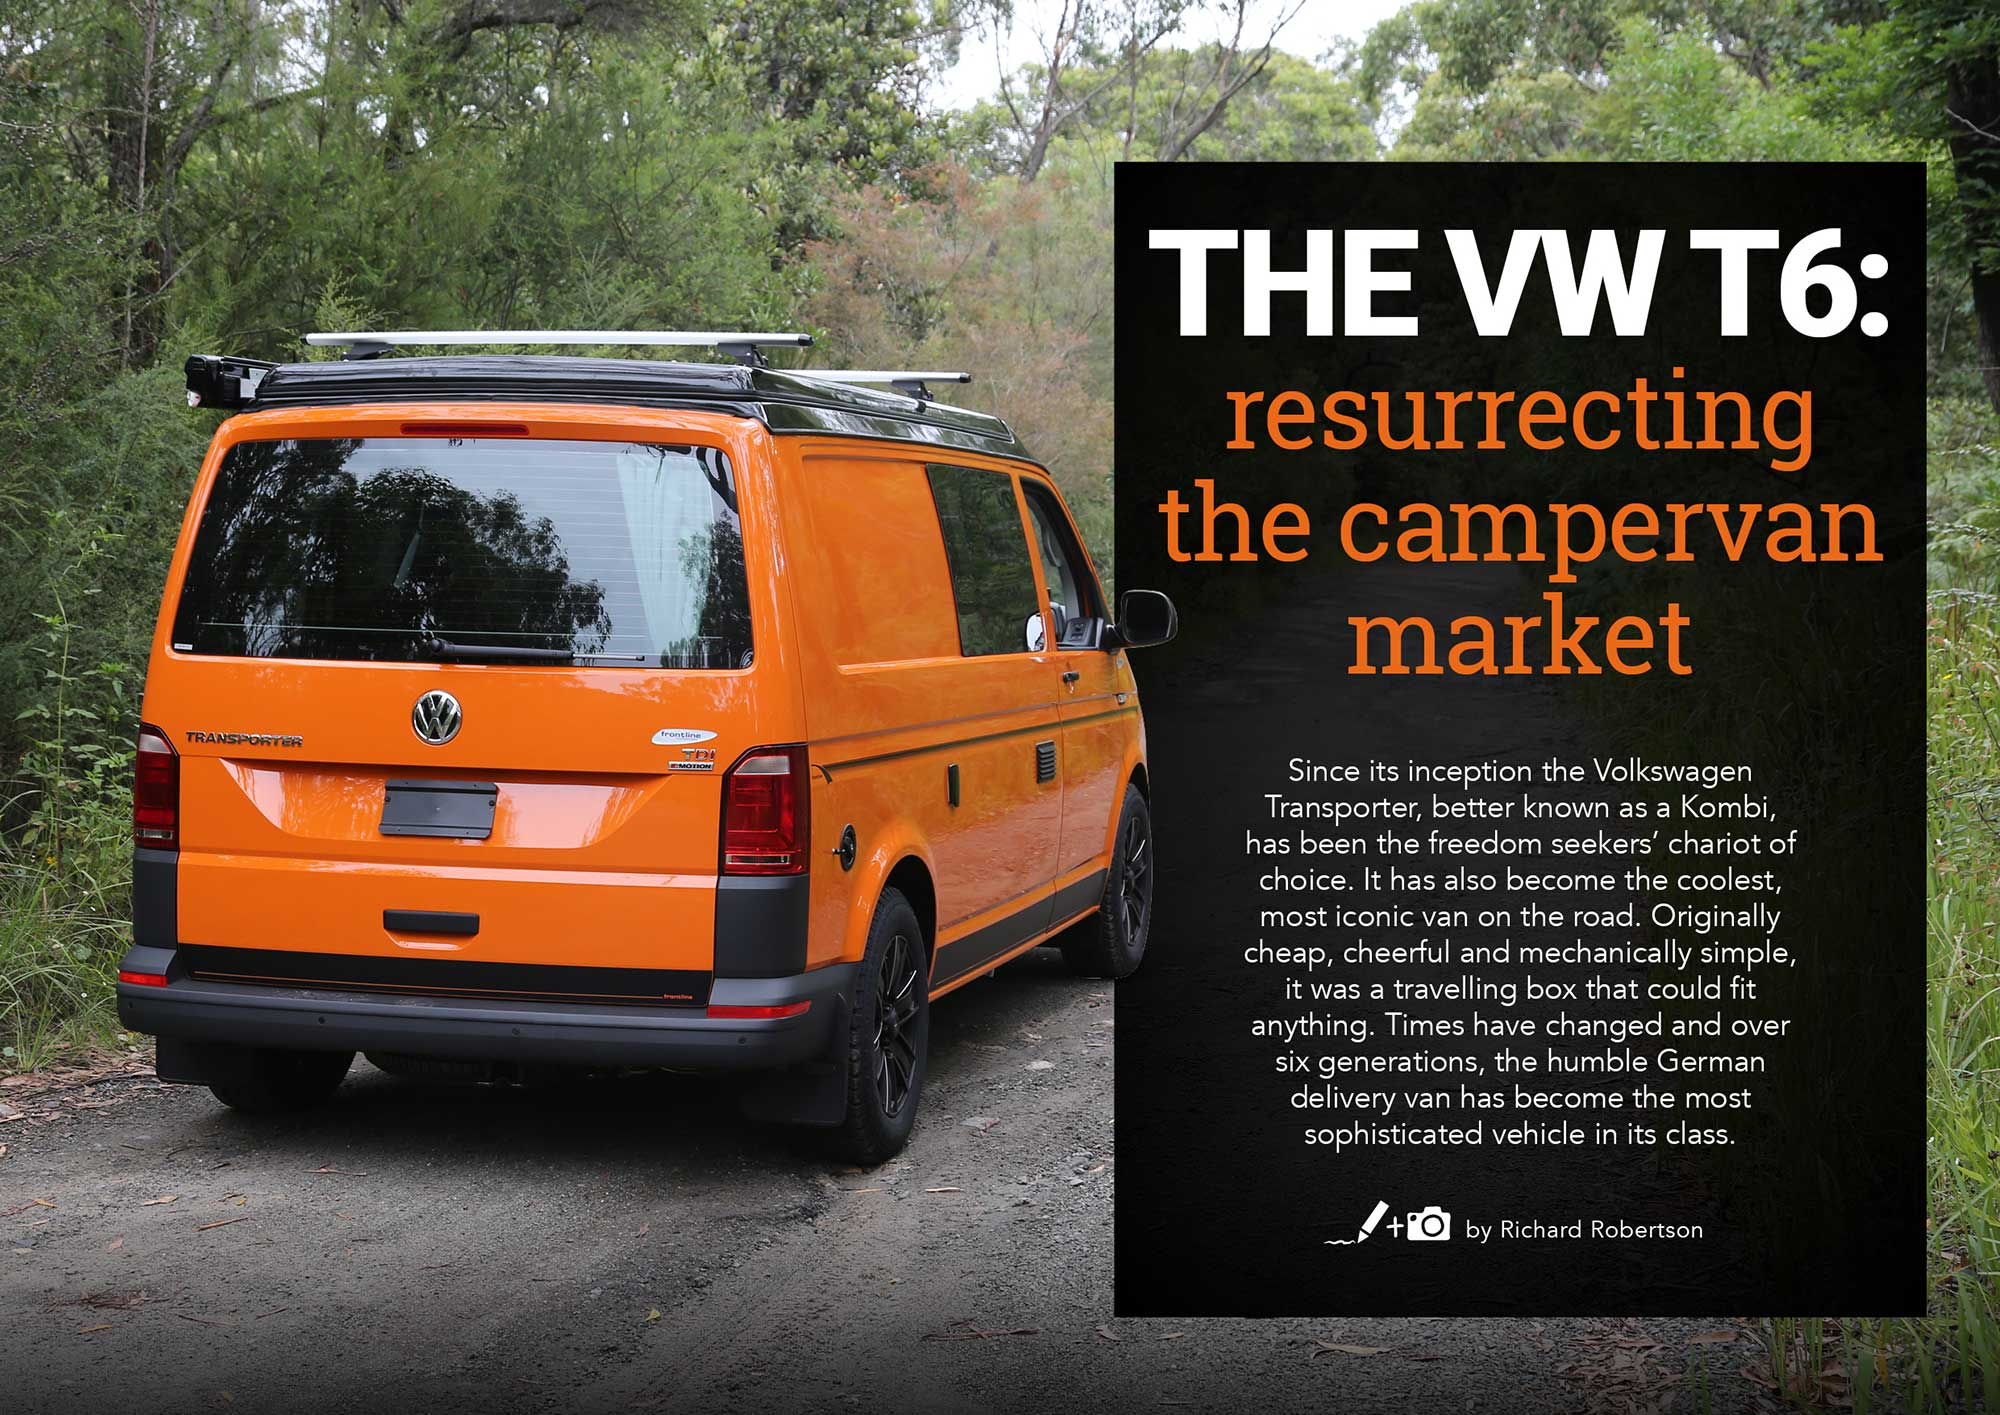 The VW T6: Resurrecting the Campervan Market